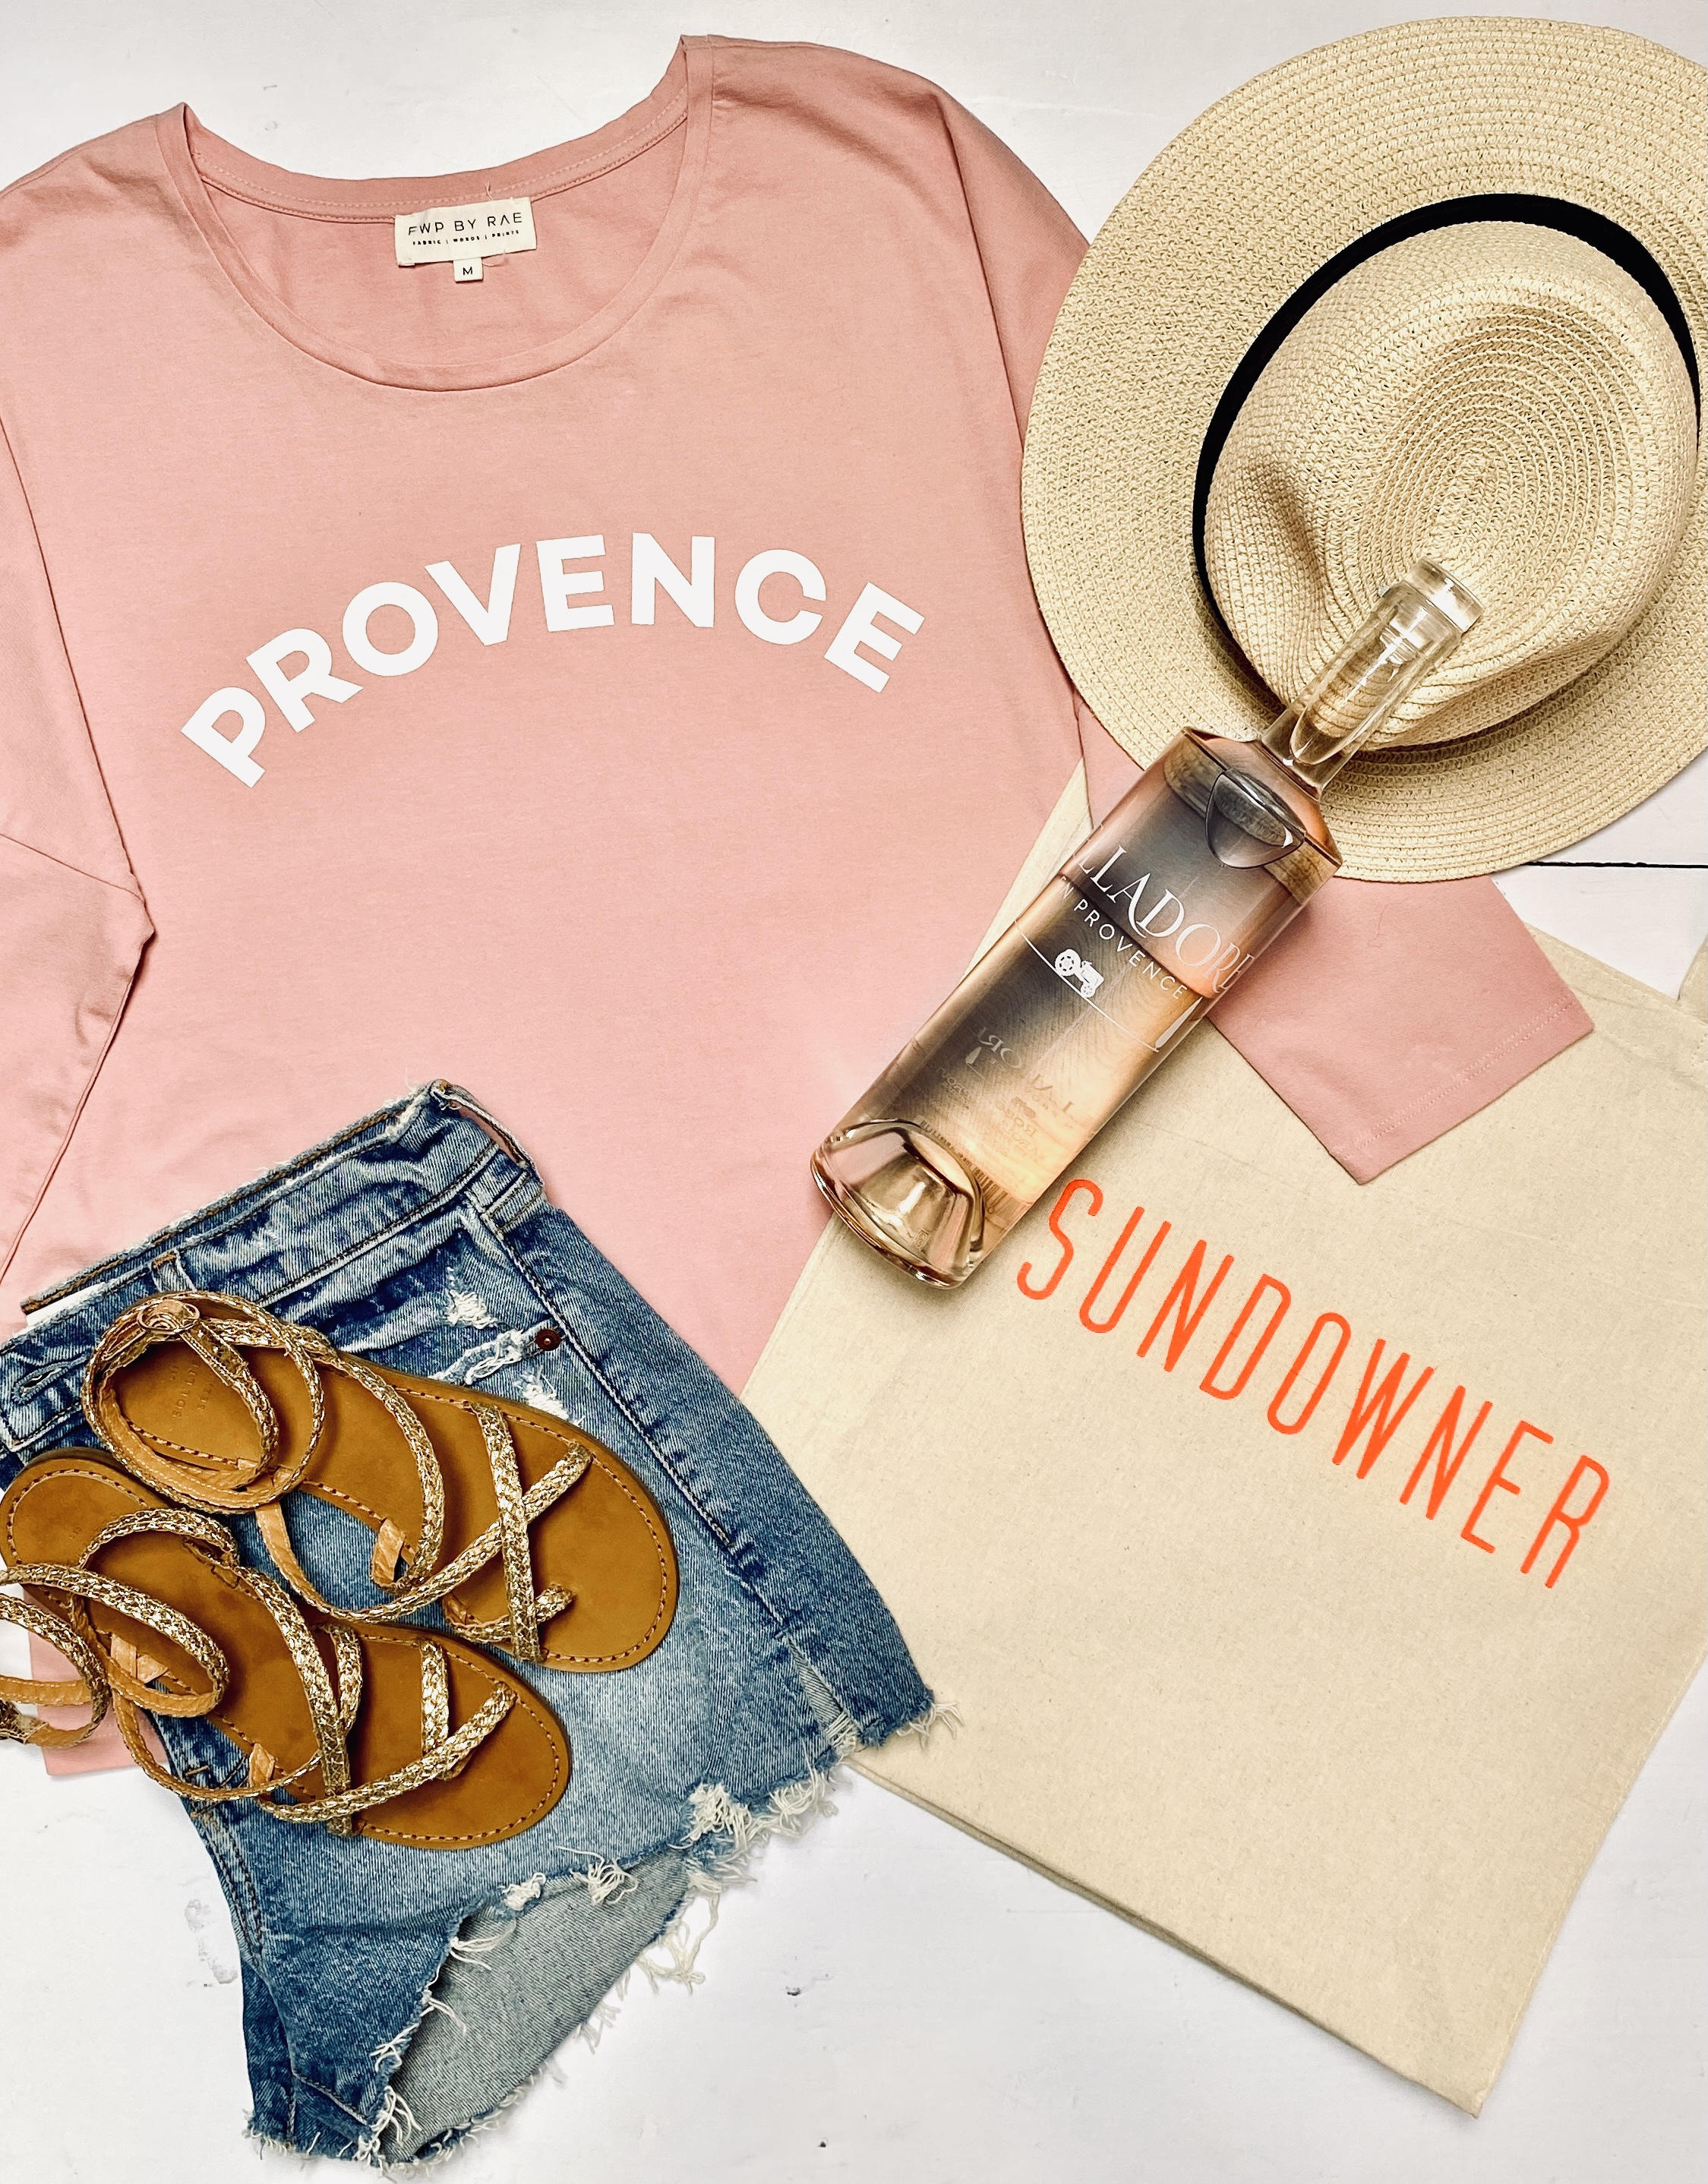 provence long sleeve t-shirt